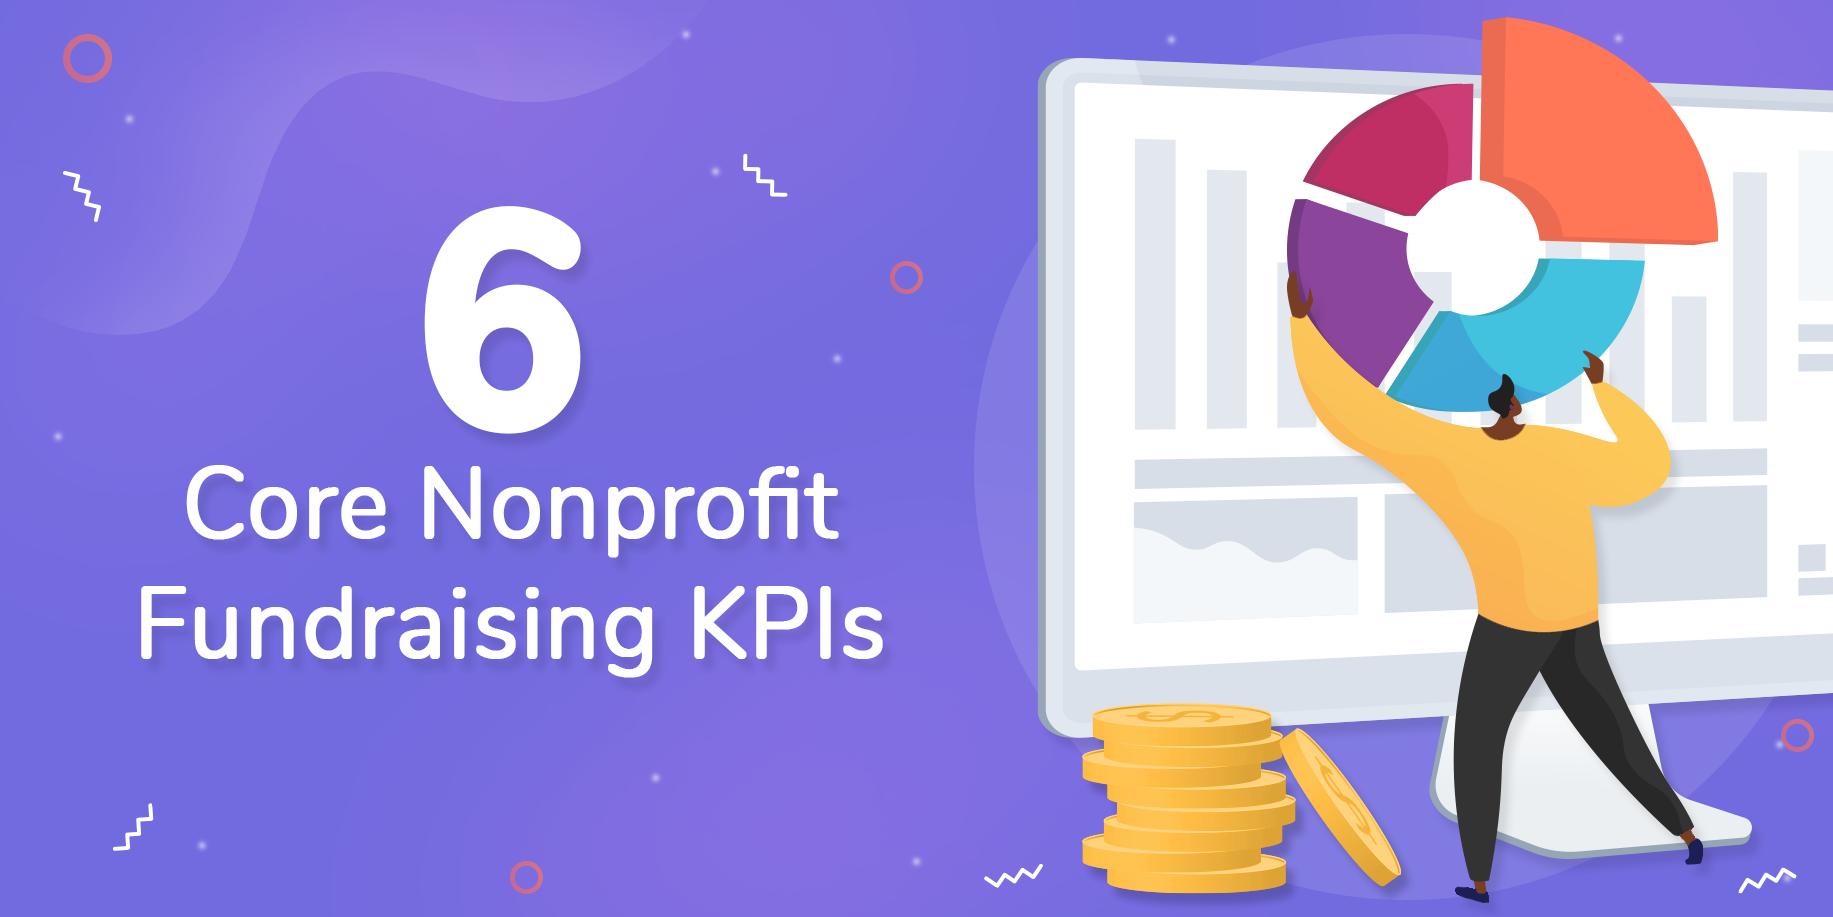 6 Core Nonprofit Fundraising KPIs header image